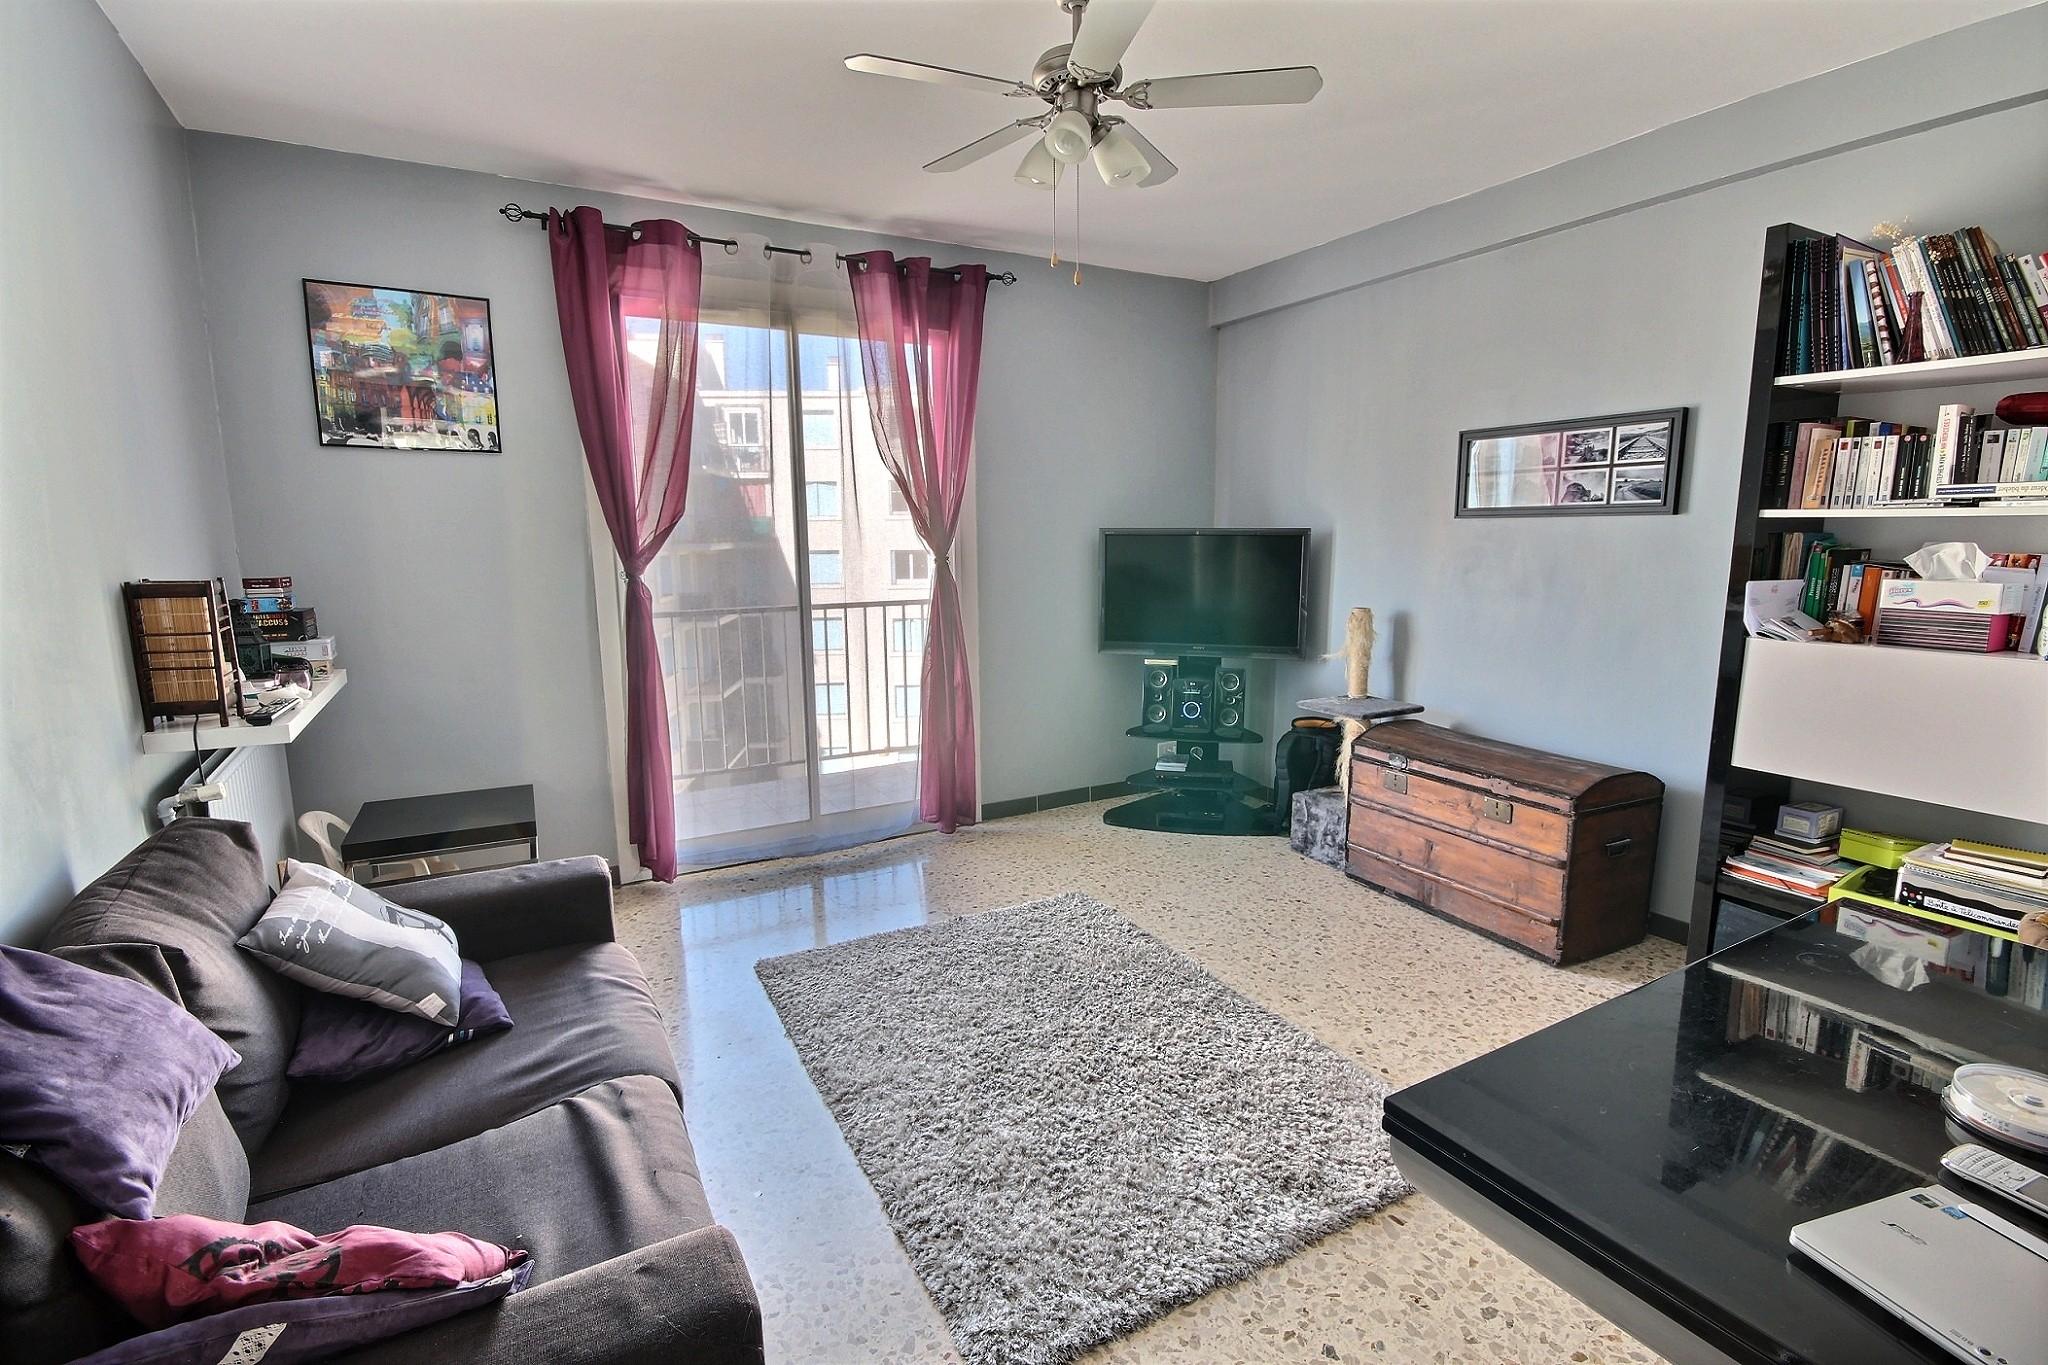 exposio 0001 cabinet lebreton. Black Bedroom Furniture Sets. Home Design Ideas